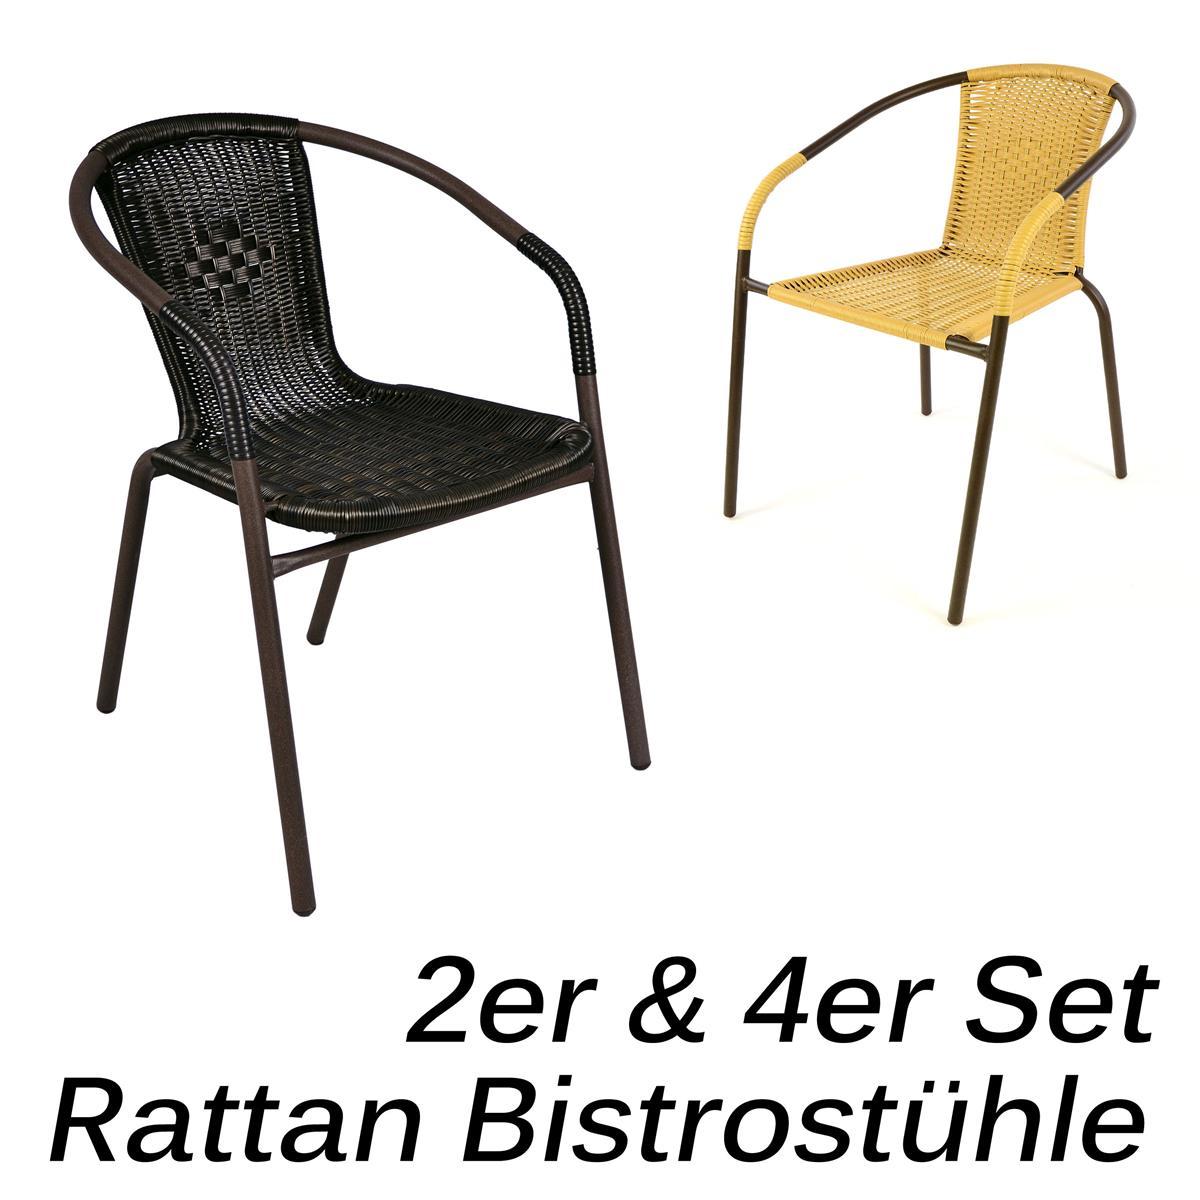 4er Set Bistrostuhl dunkel-braun Stapelstuhl Gartenstuhl Rattan Terrasse Stuhl